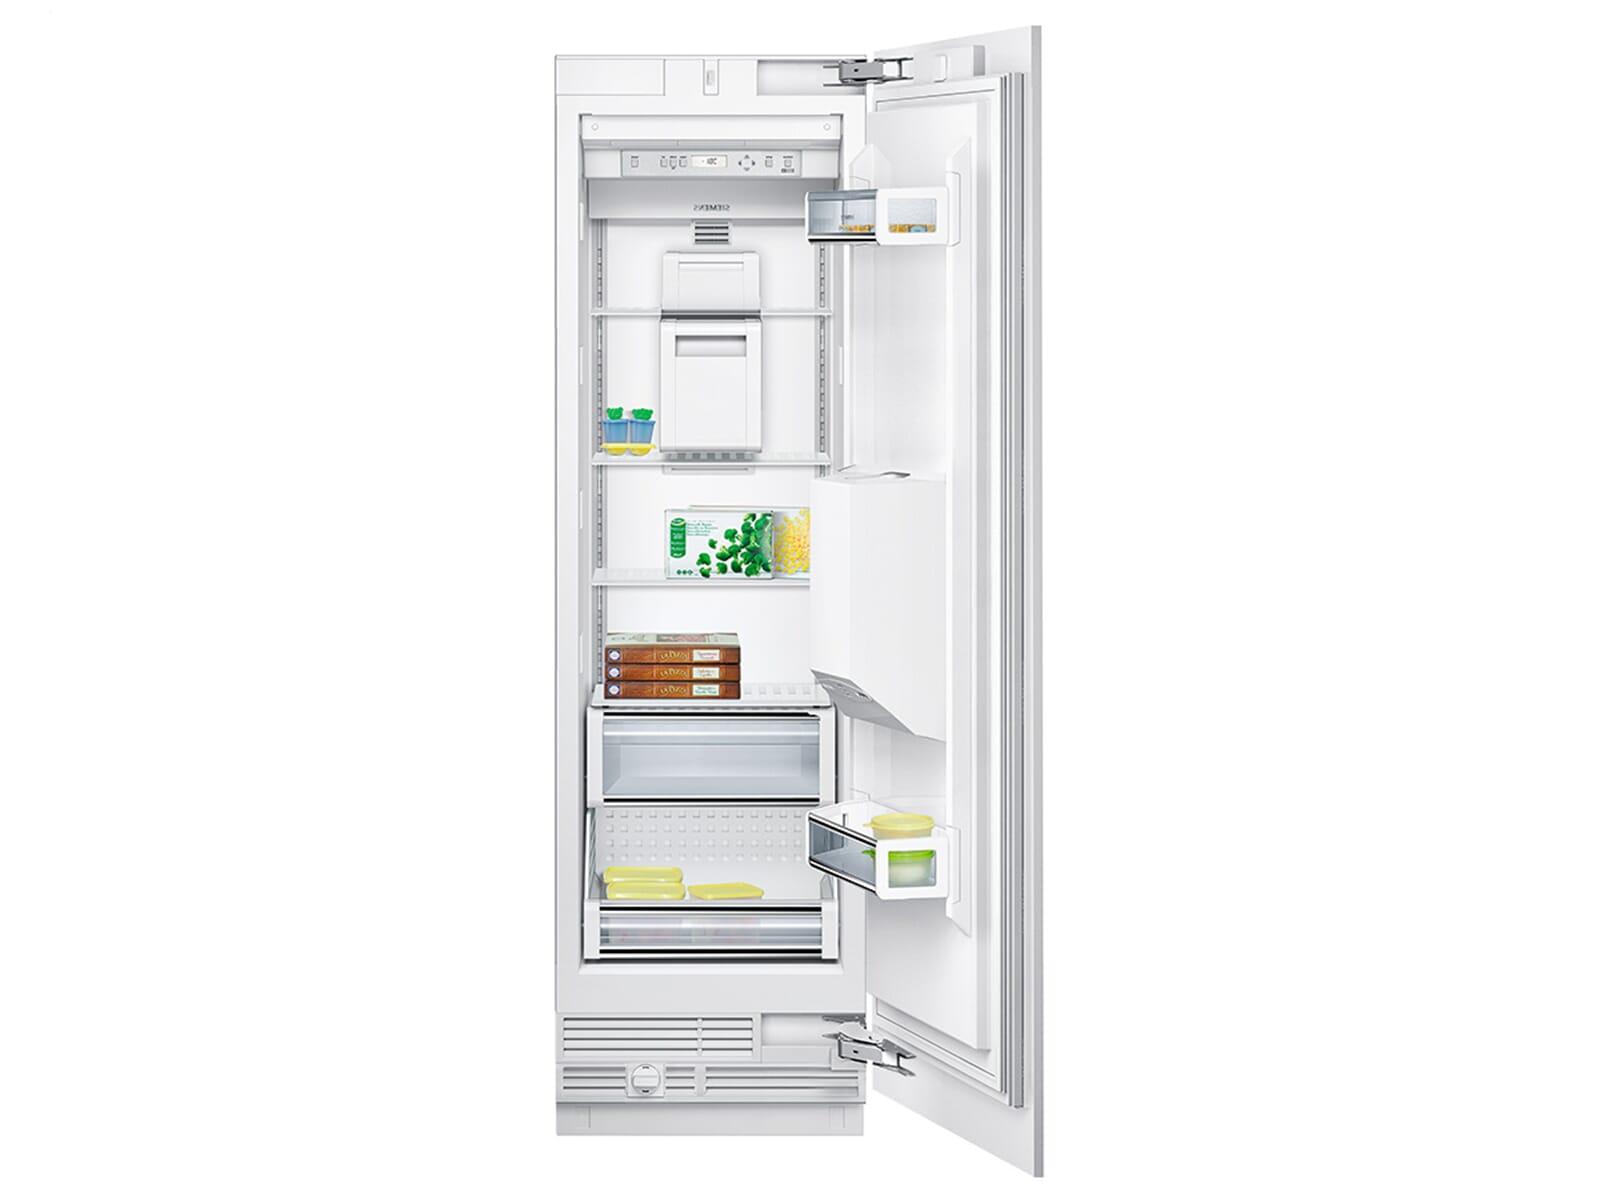 Siemens Studioline Kühlschrank : Siemens studioline kühlschrank hausgeräte siemens ki fsd